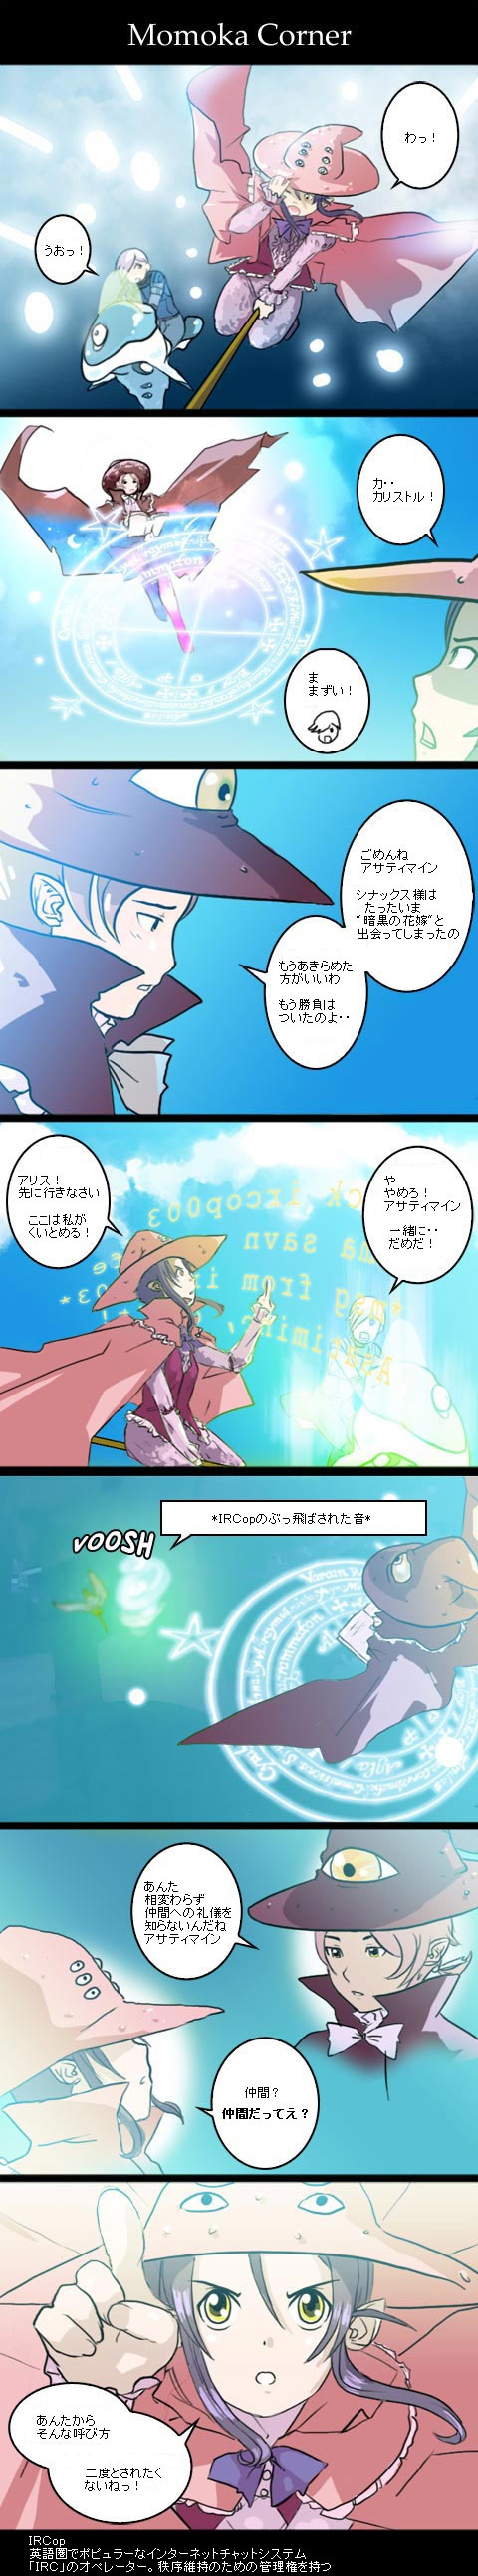 [Momoka Corner- strip 8]